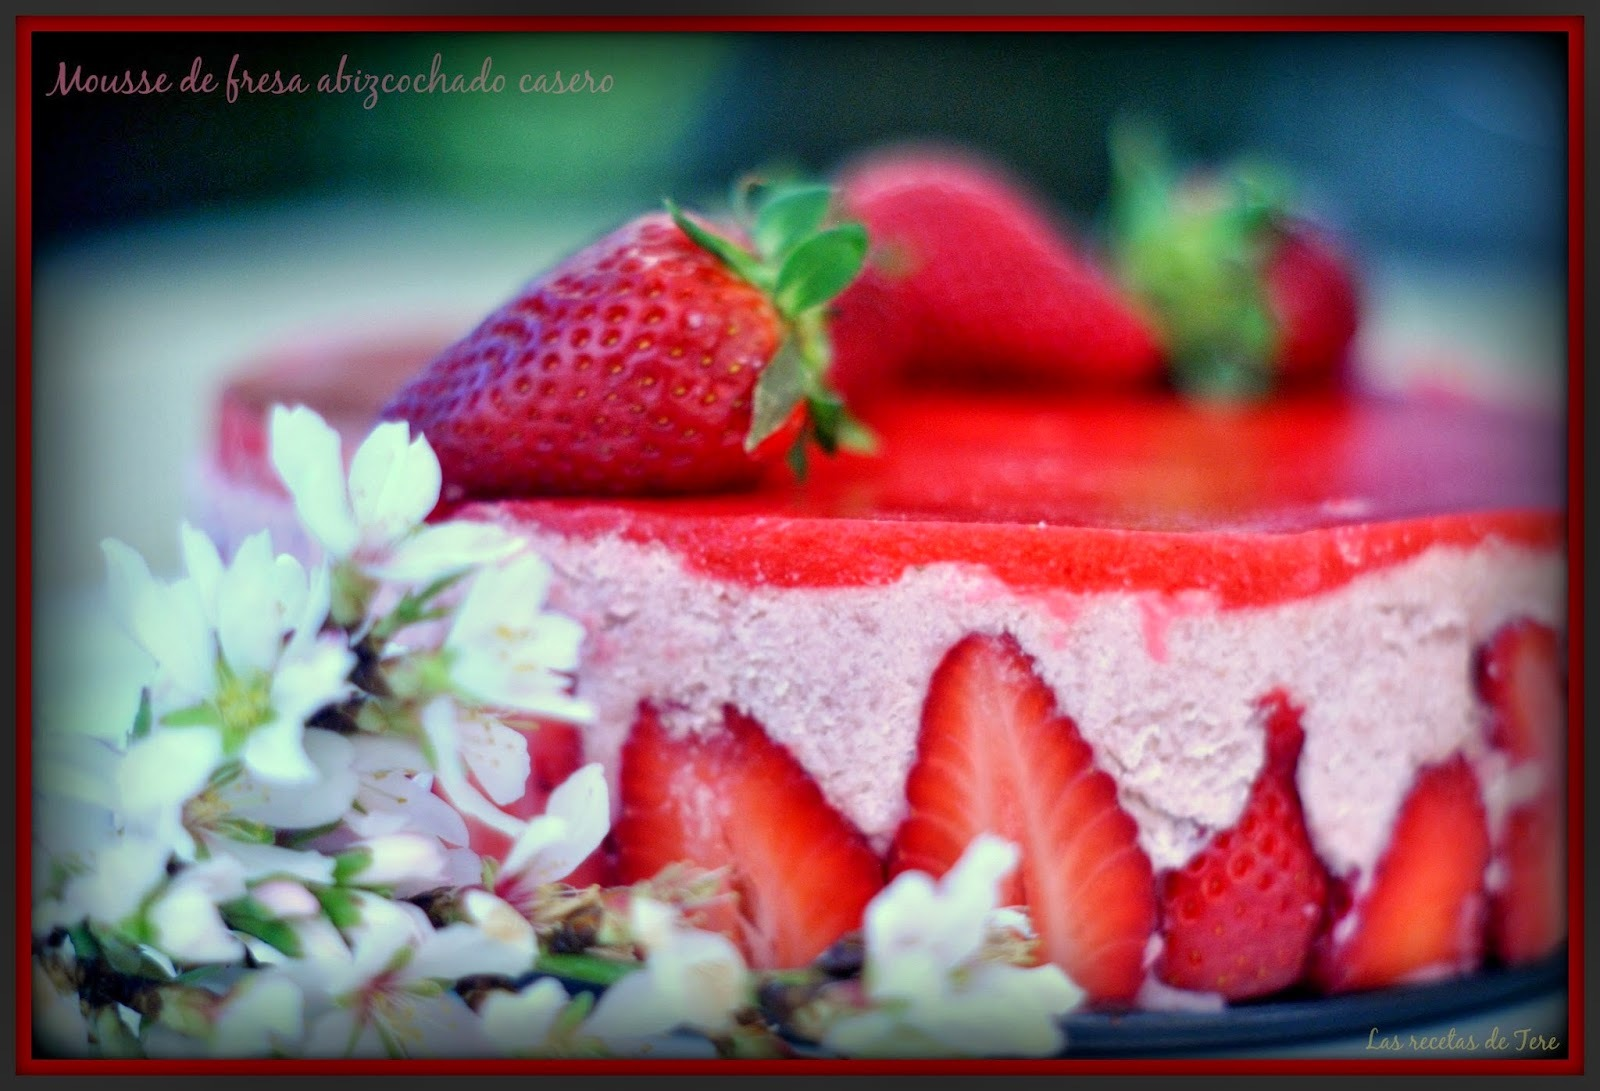 Mousse de fresas abizcochado.